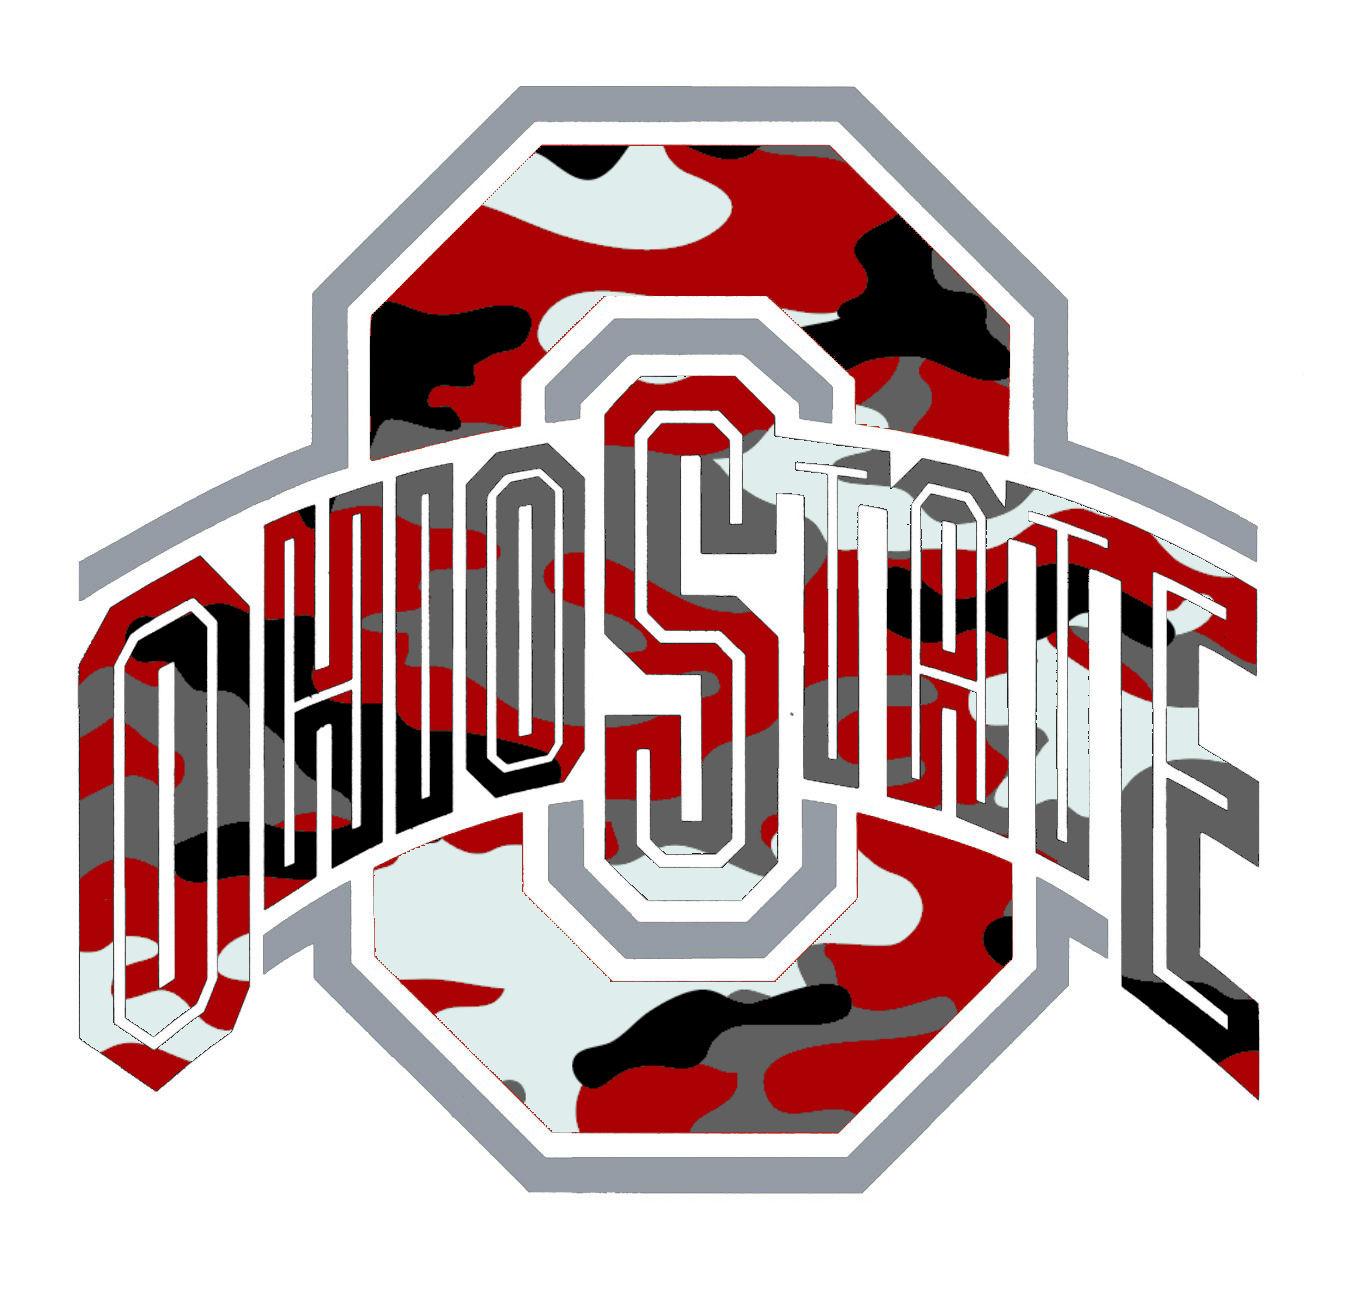 Ohio State Buckeyes Logo Clip Art N4 free image